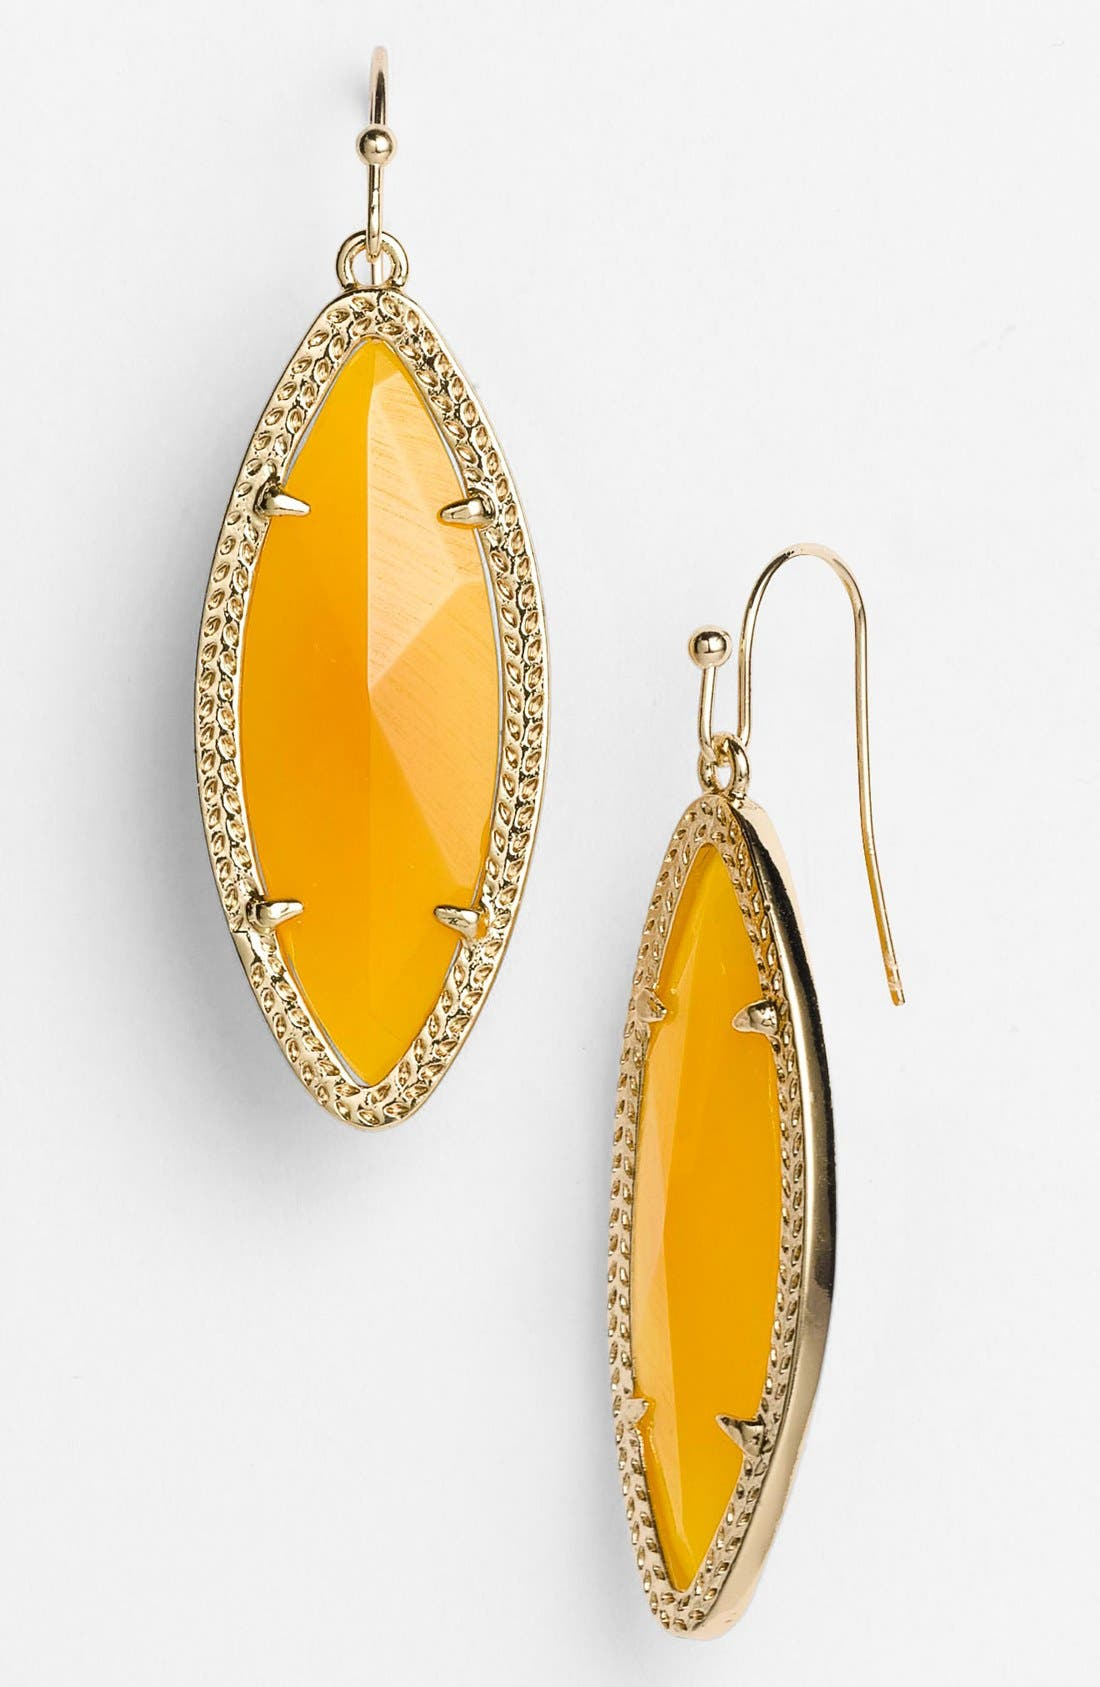 Alternate Image 1 Selected - Kendra Scott 'Dora' Stone Drop Earrings (Nordstrom Exclusive)